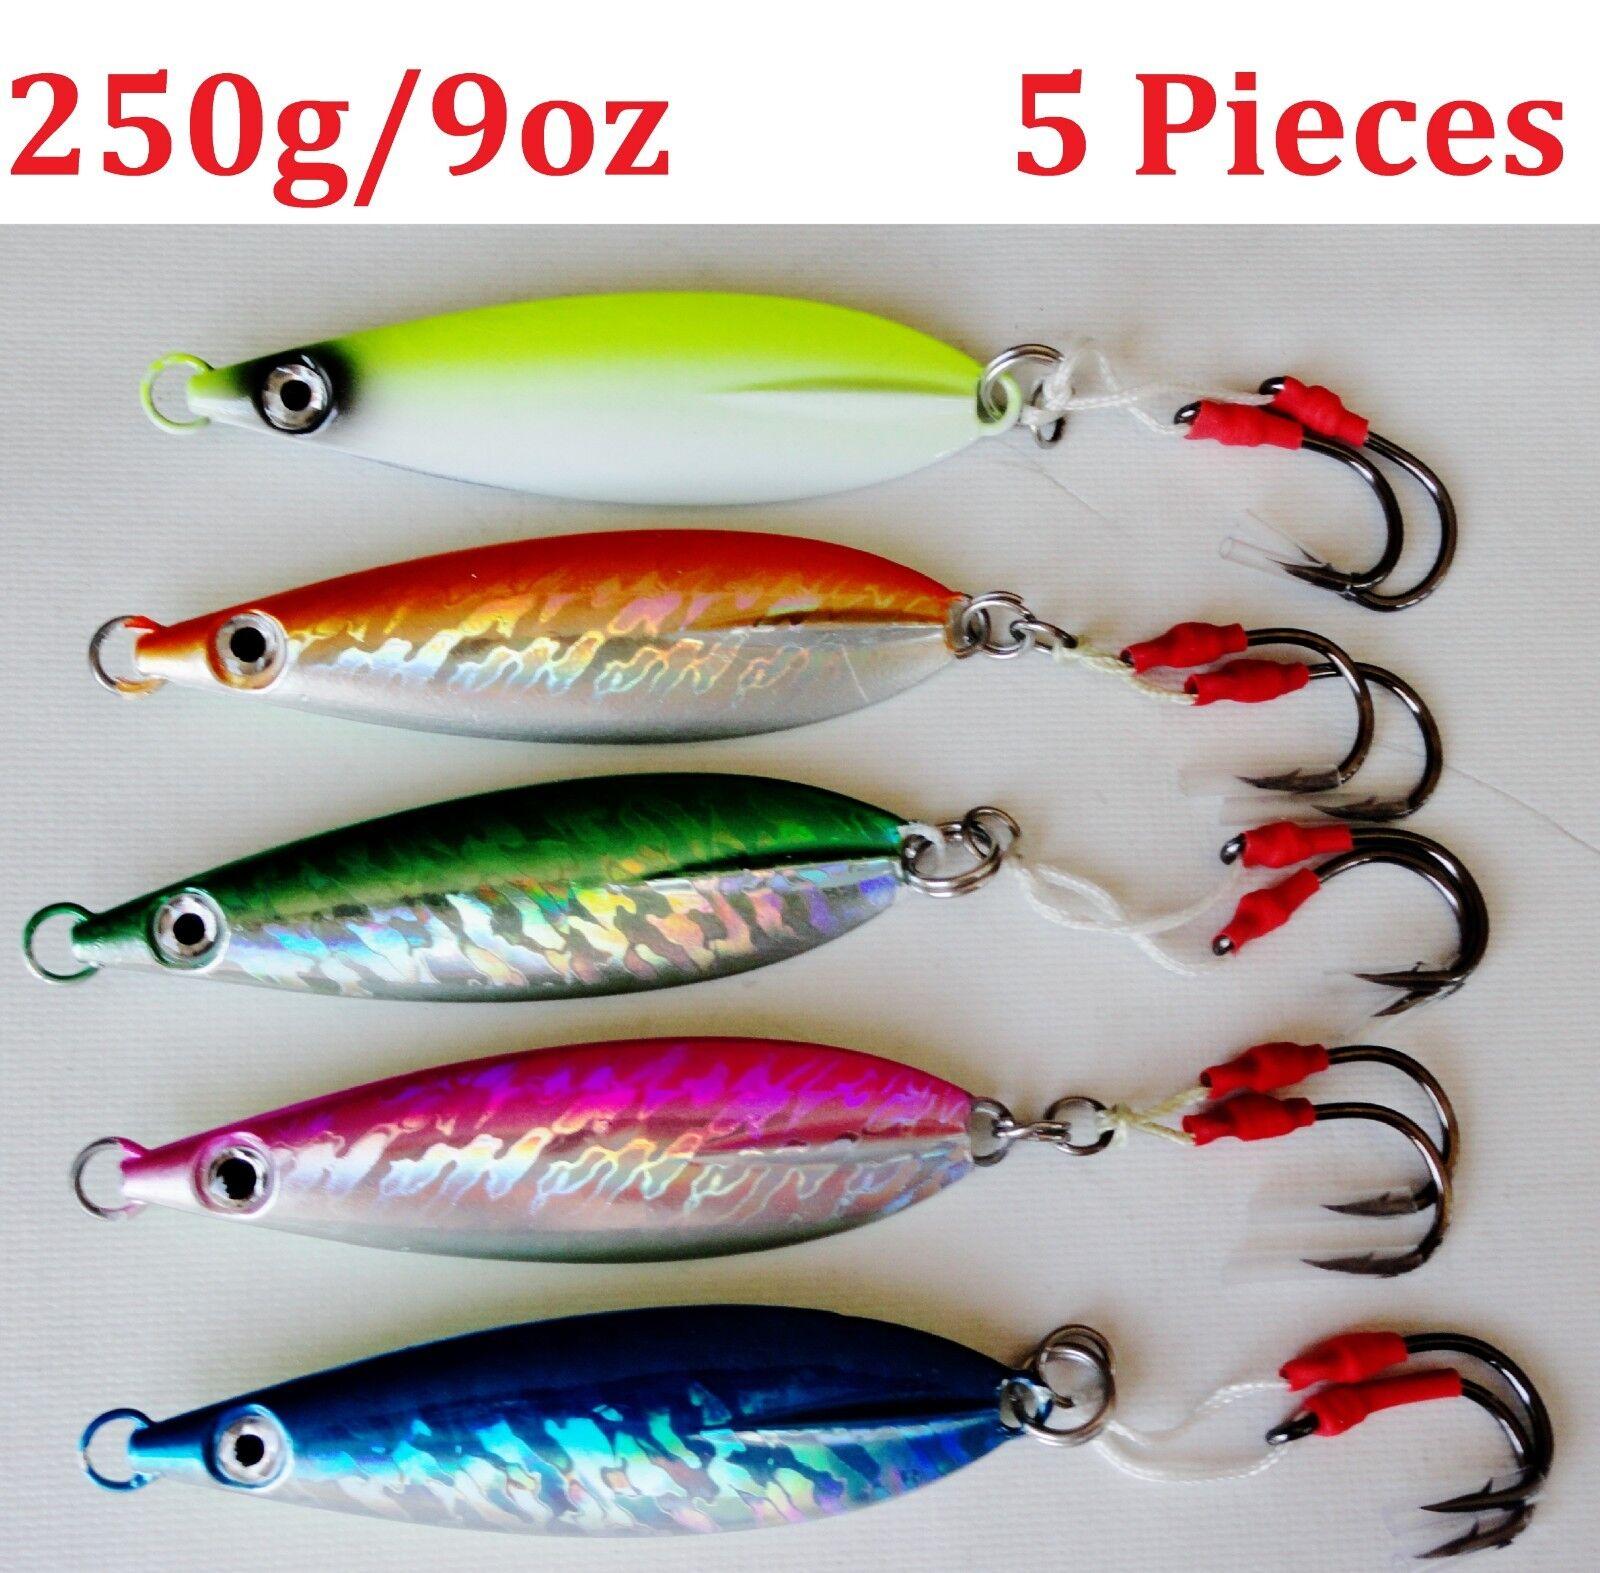 5 pc Fast Fall greenical Keel Flat Knife Jigs 250g (9oz) Saltwater Fishing Lures